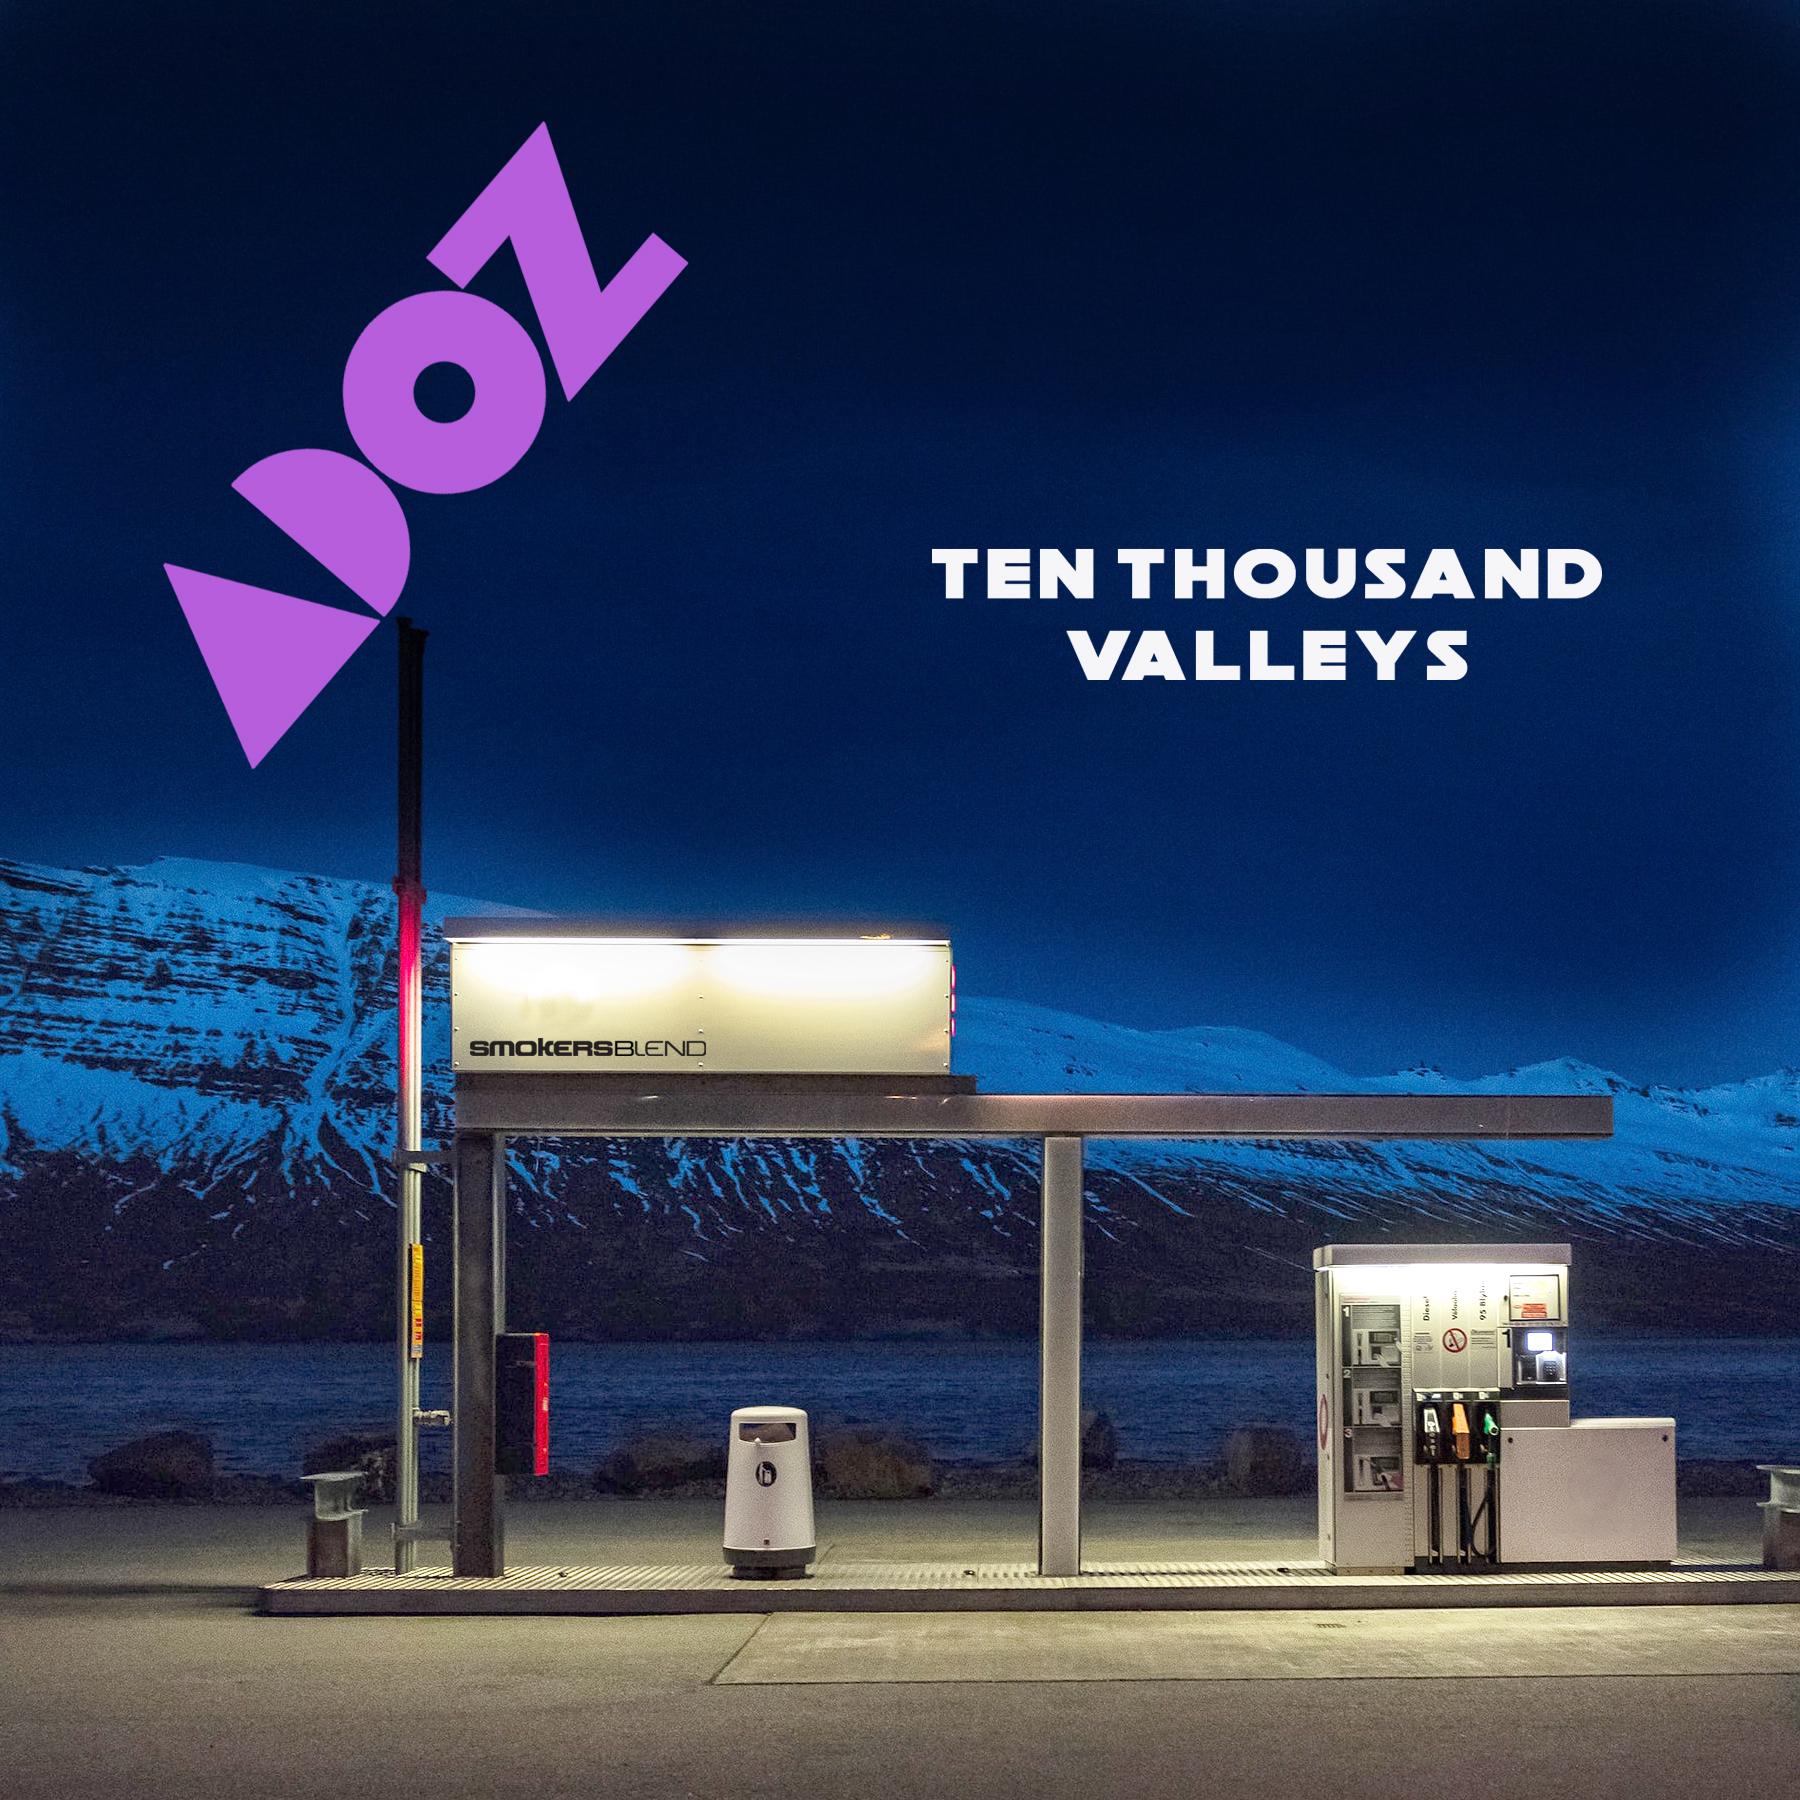 Ten Thousand Valleys